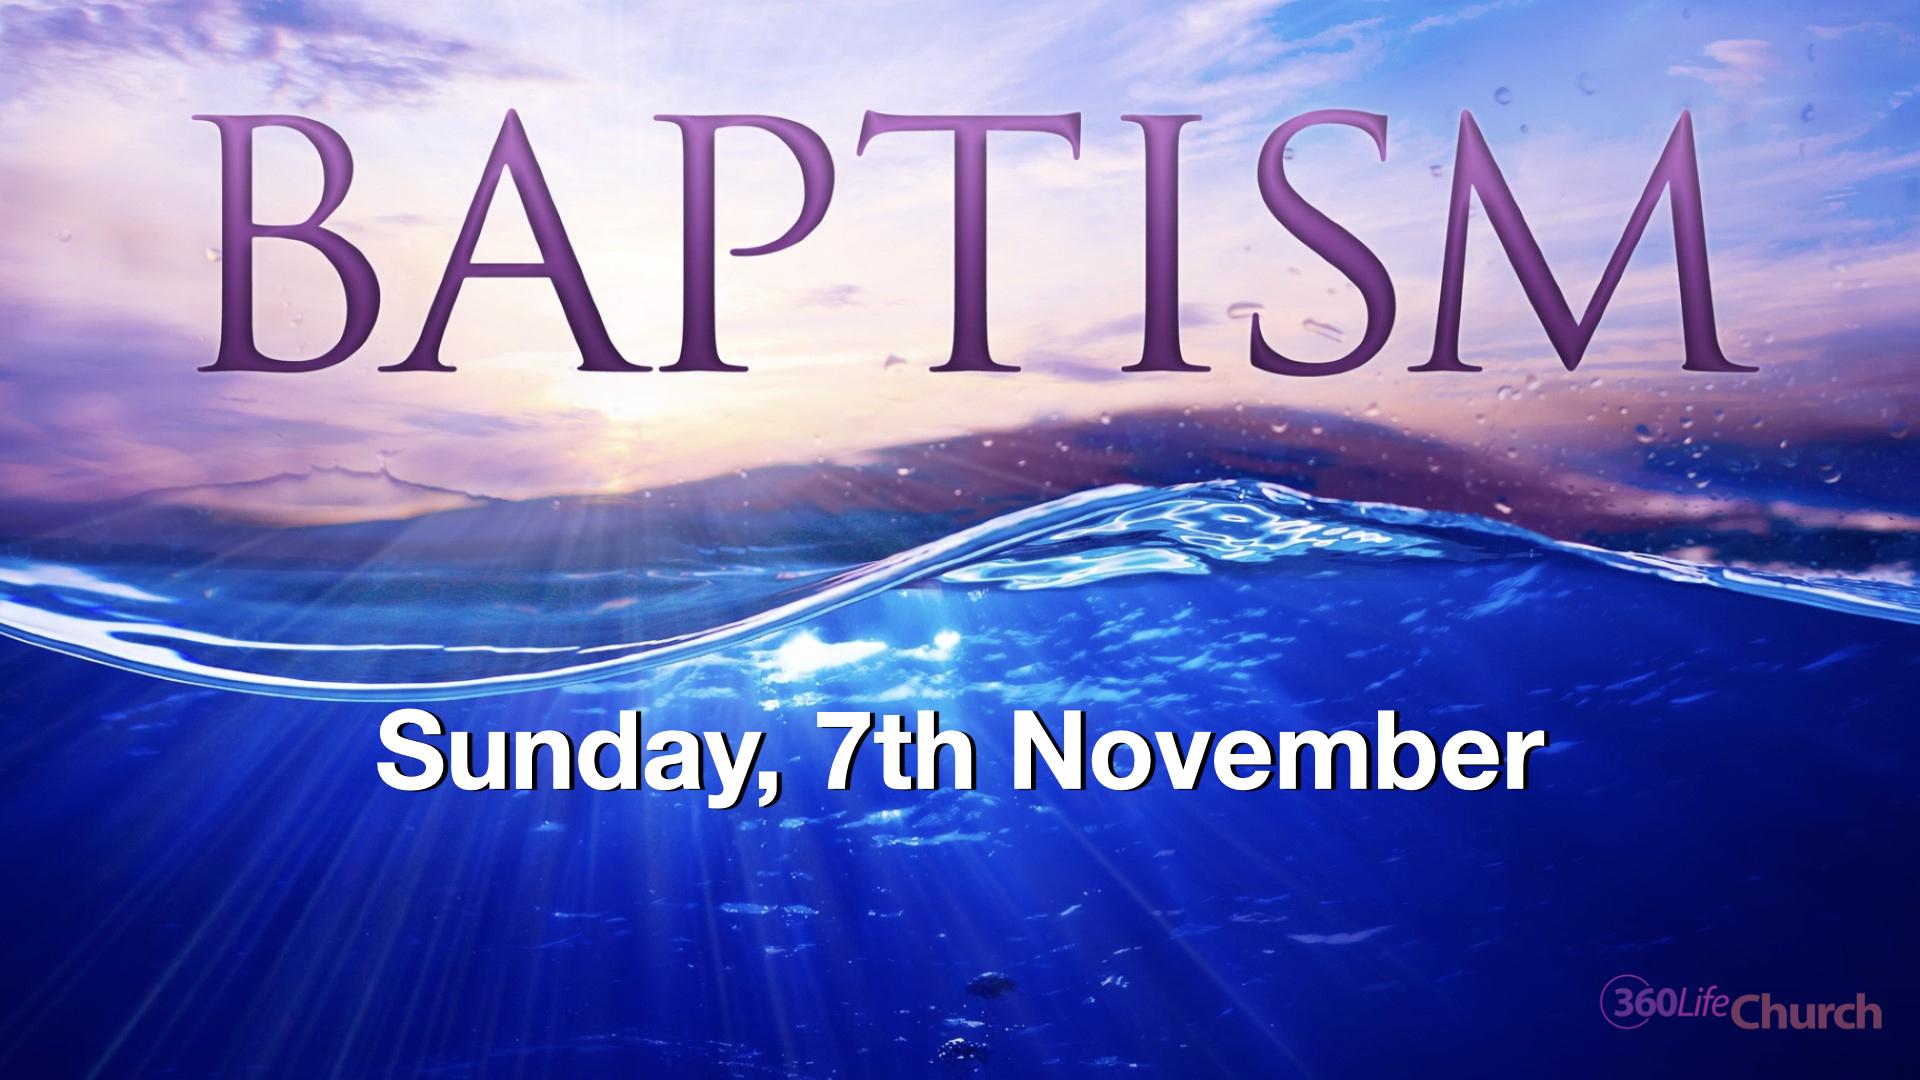 Baptismal service